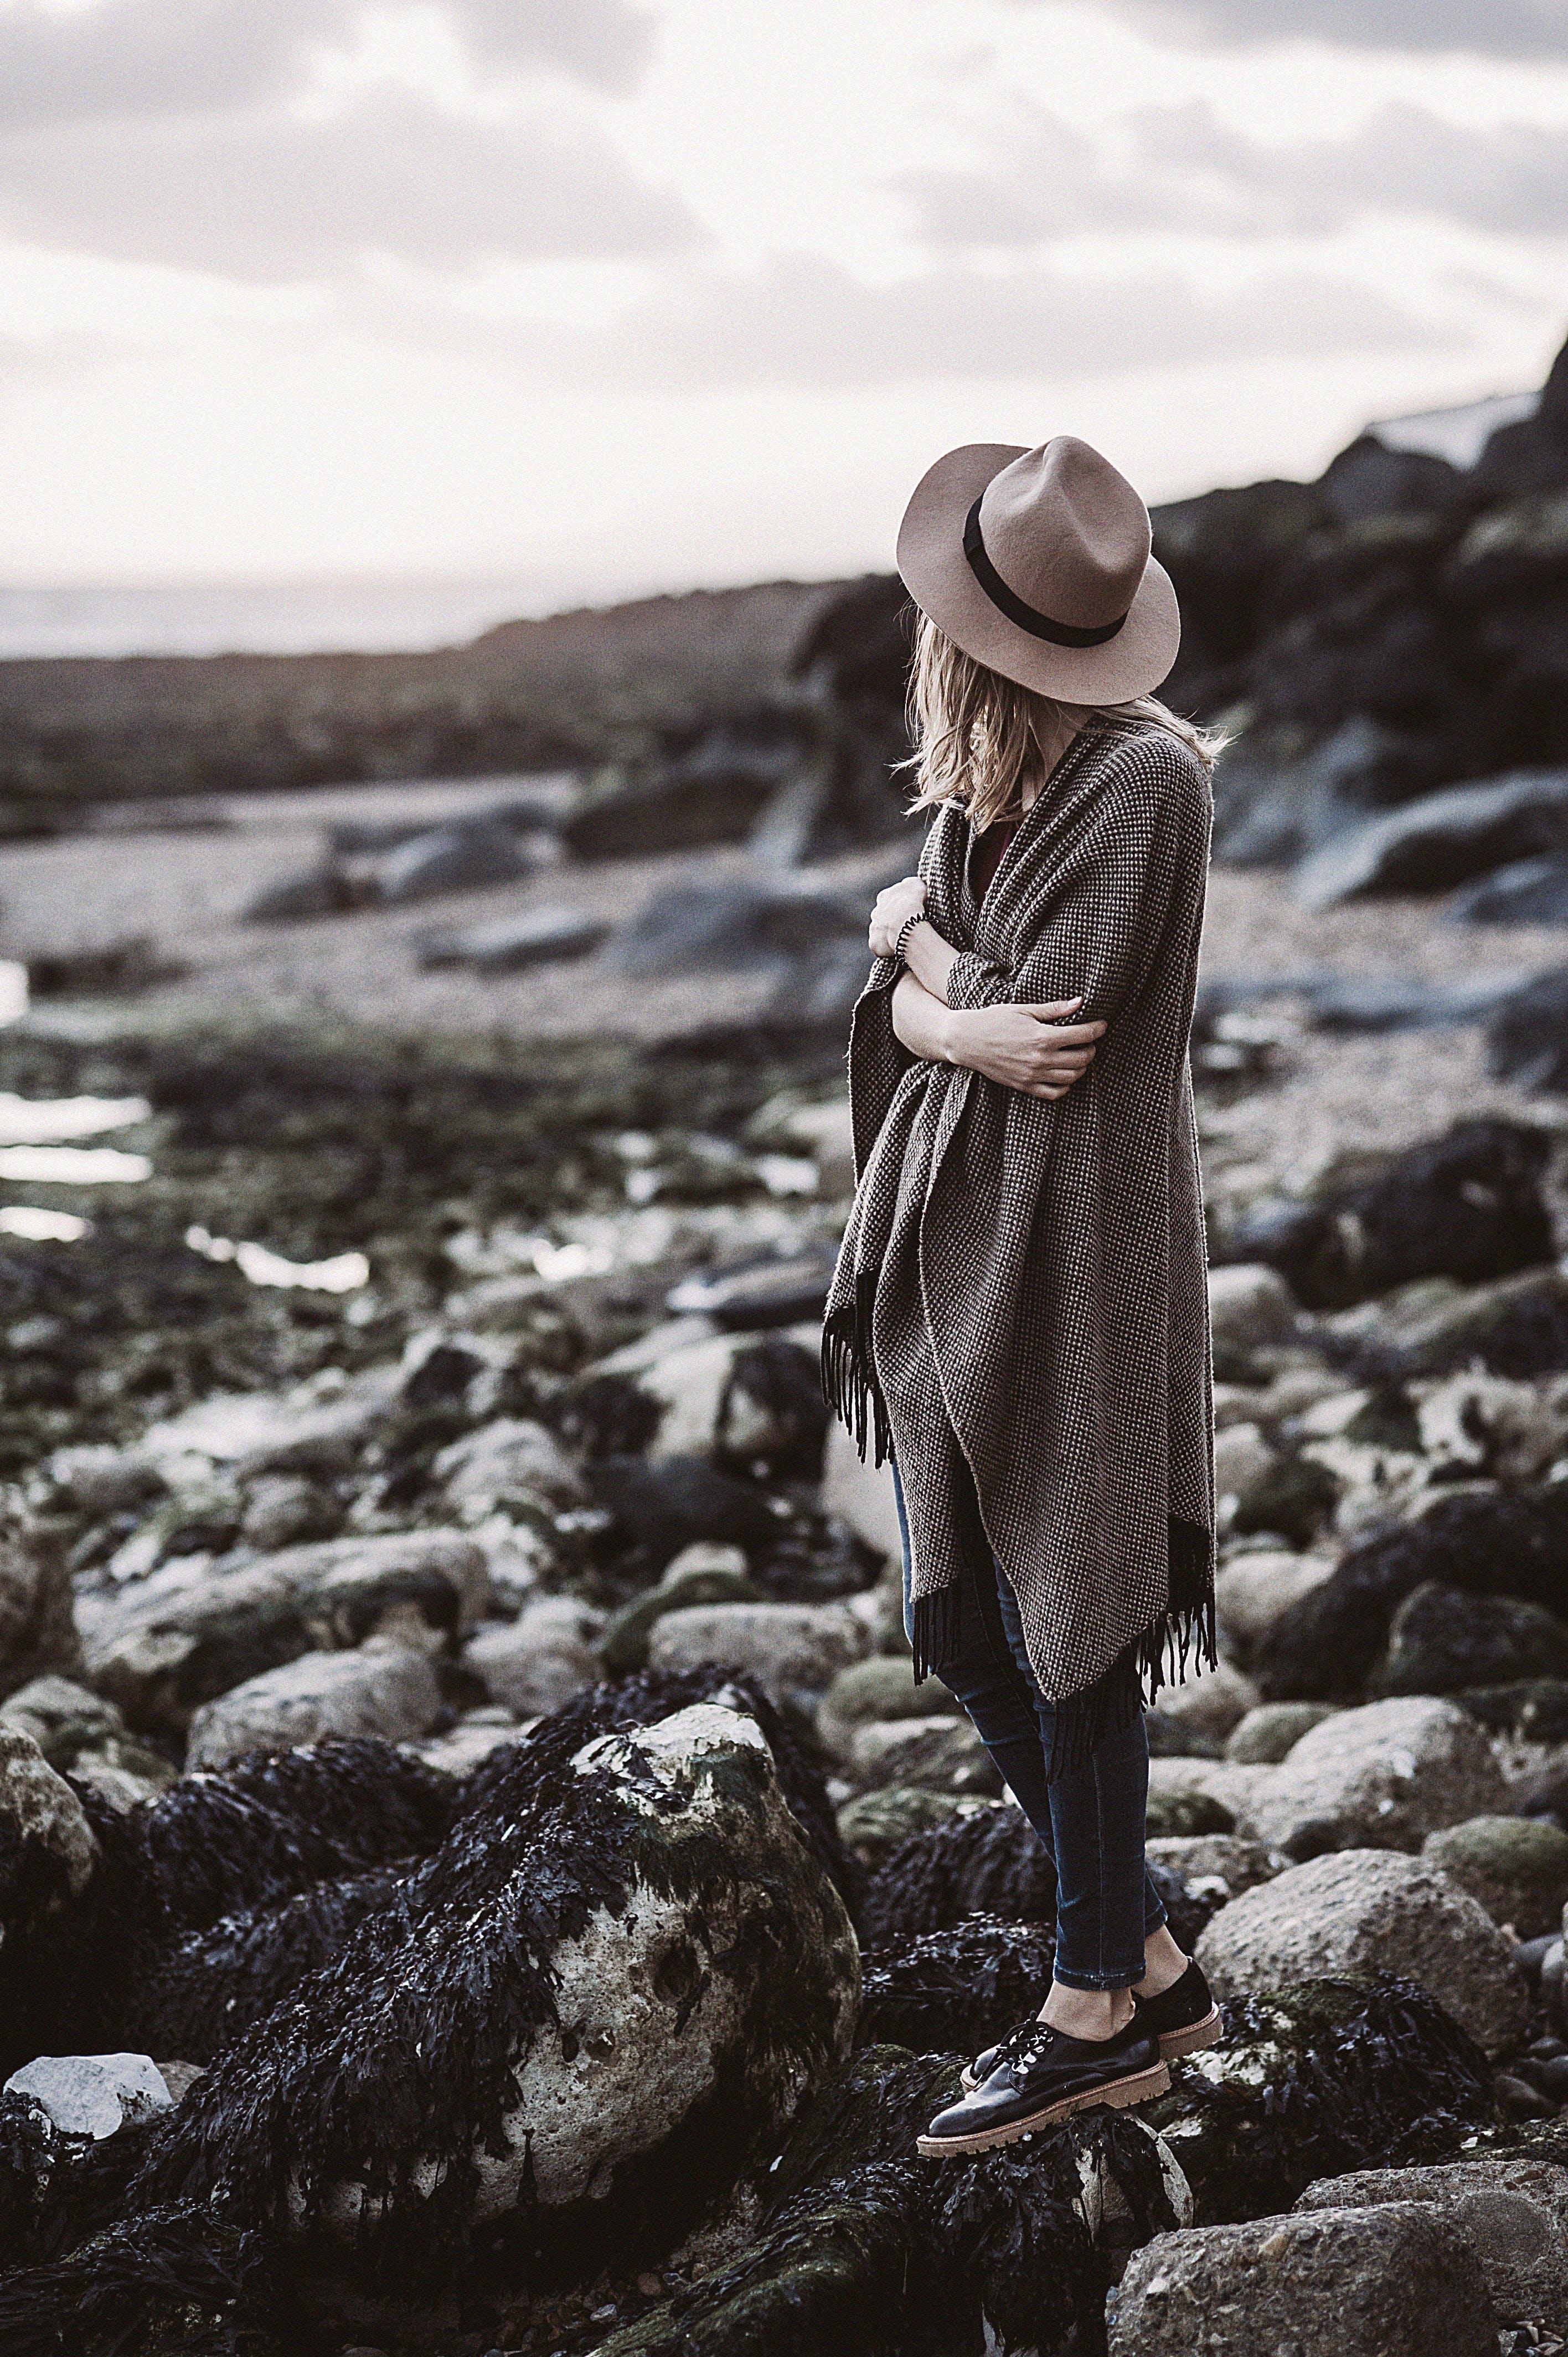 Woman Wearing Draped Coat Standing on Rock Facing Mountain